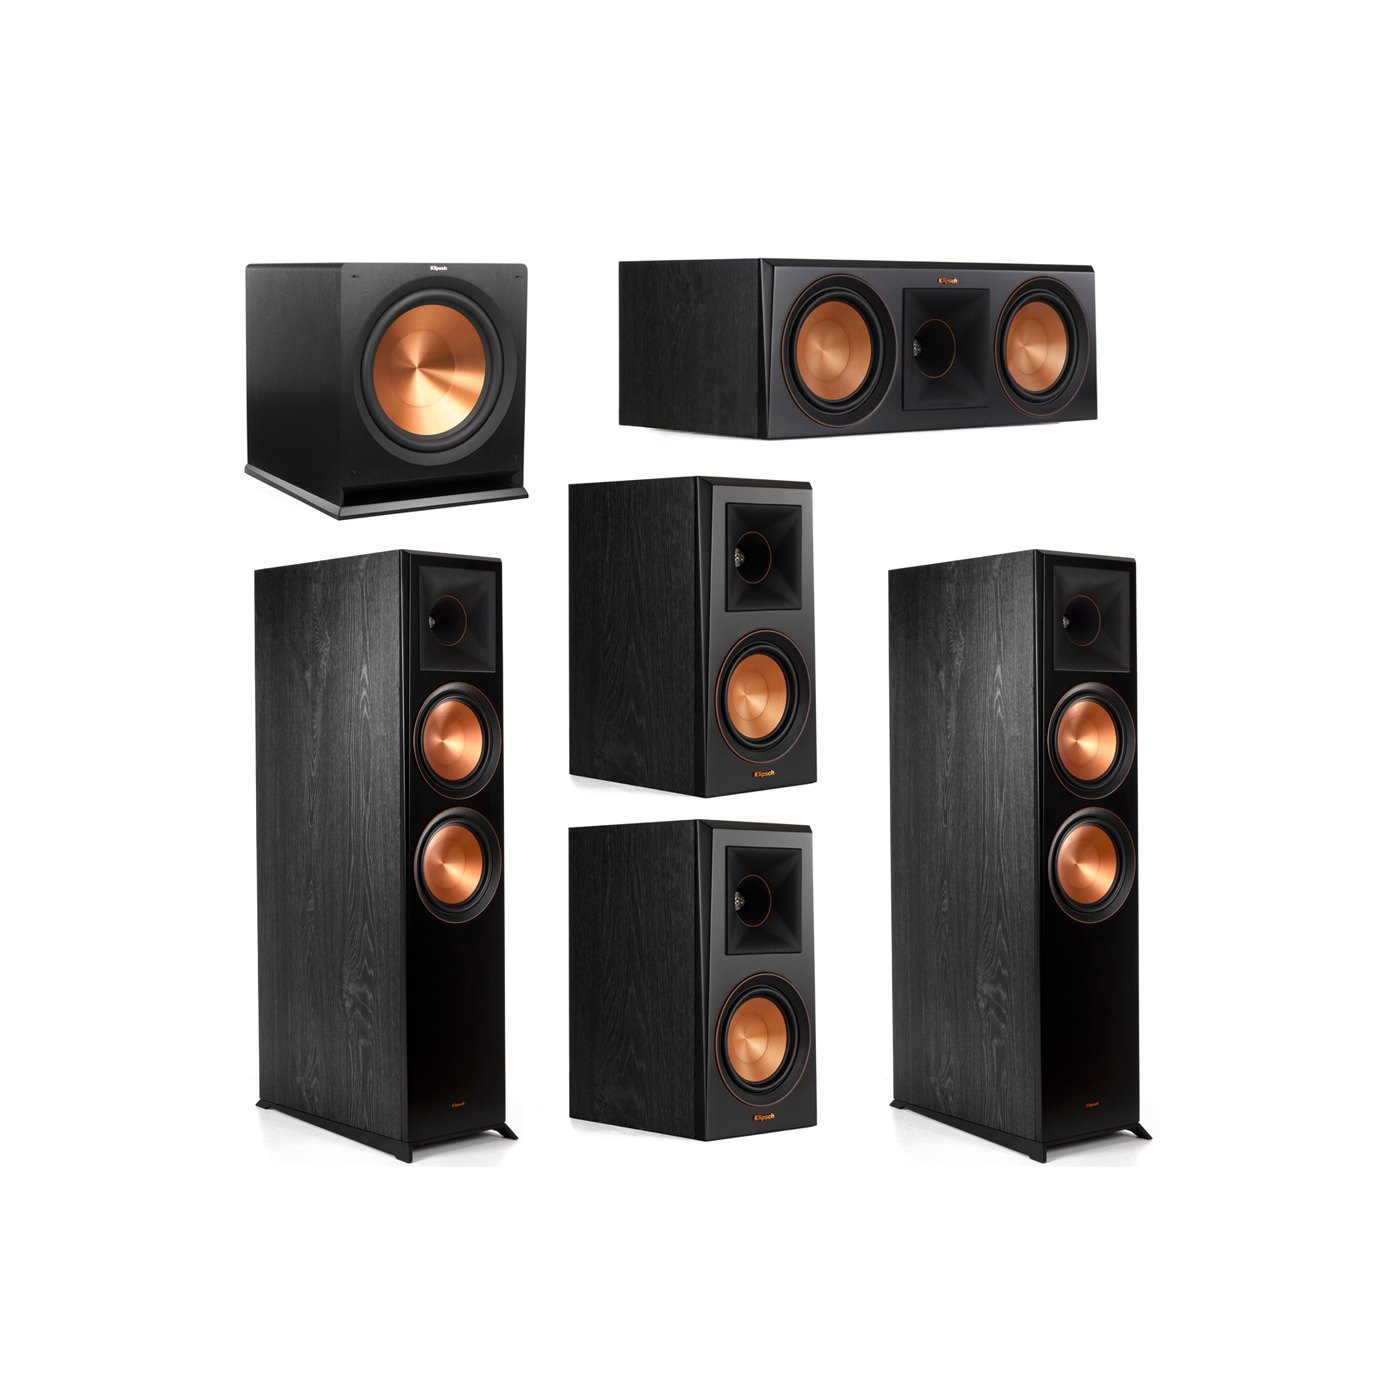 Klipsch 5.1 System with 2 RP-8000F Floorstanding Speakers, 1 Klipsch RP-600C Center Speaker, 2 Klipsch RP-500M Surround Speakers, 1 Klipsch R-115SW Subwoofer